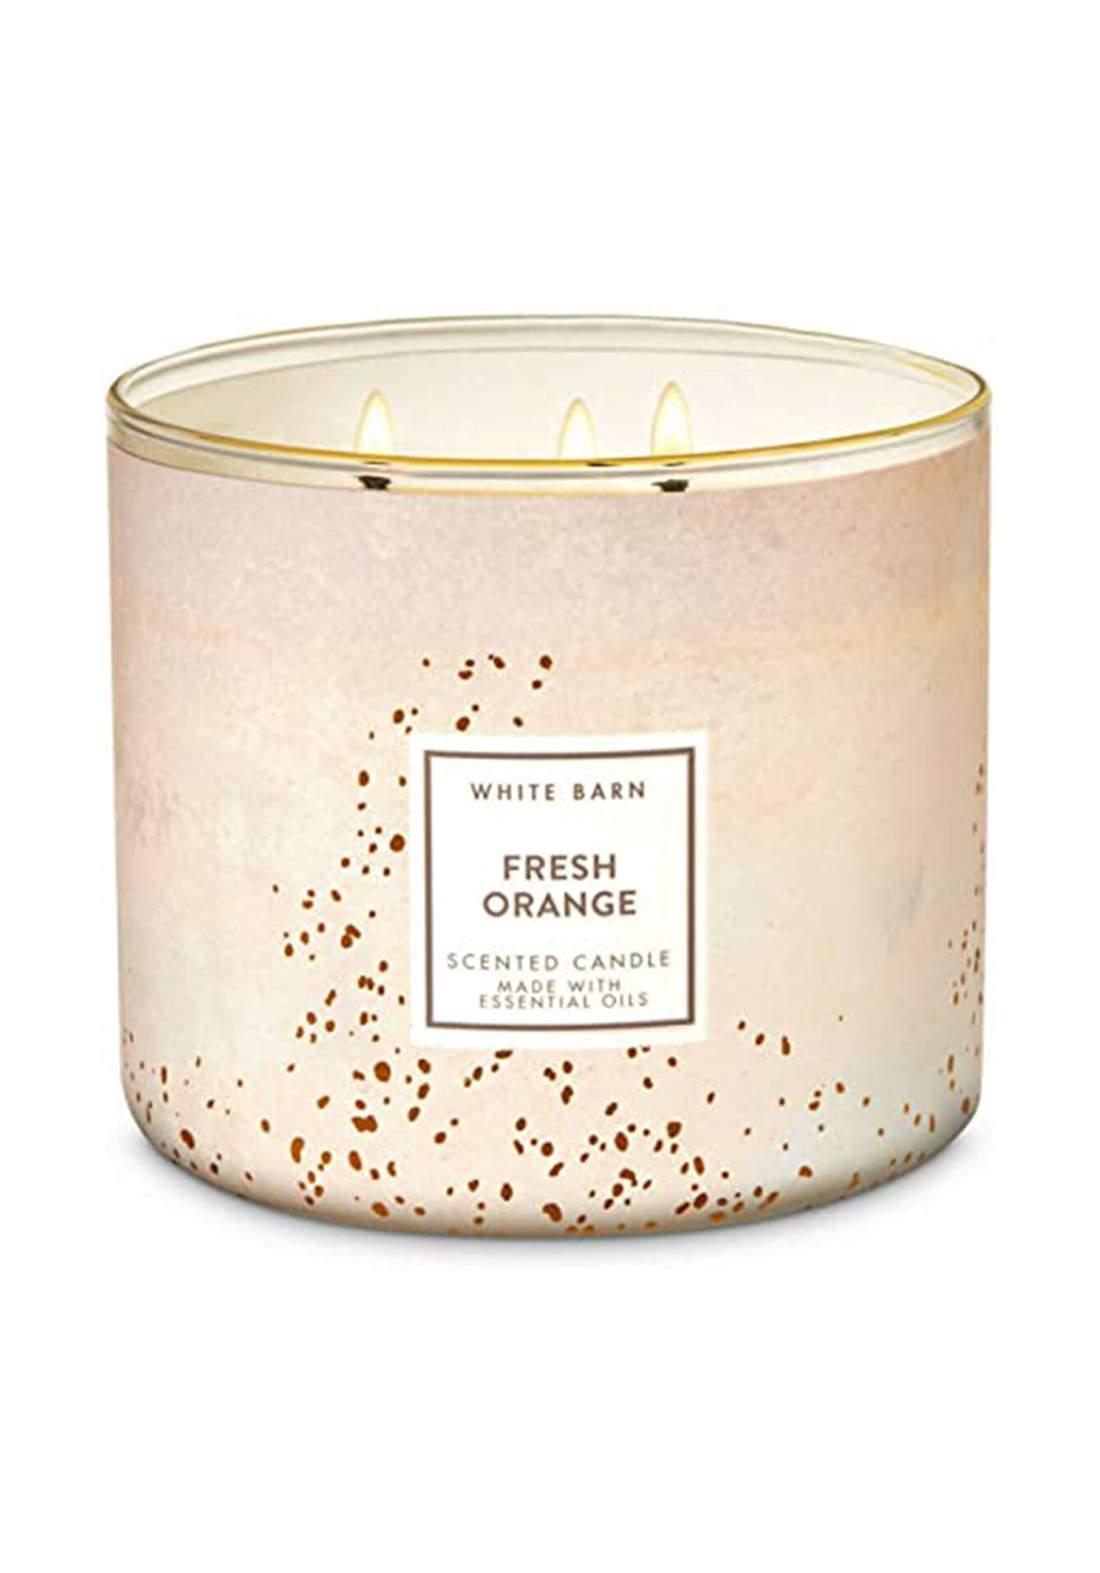 White Barn Bath and Body Works 3-Wick Scented Candle Orange شمعة عطرية